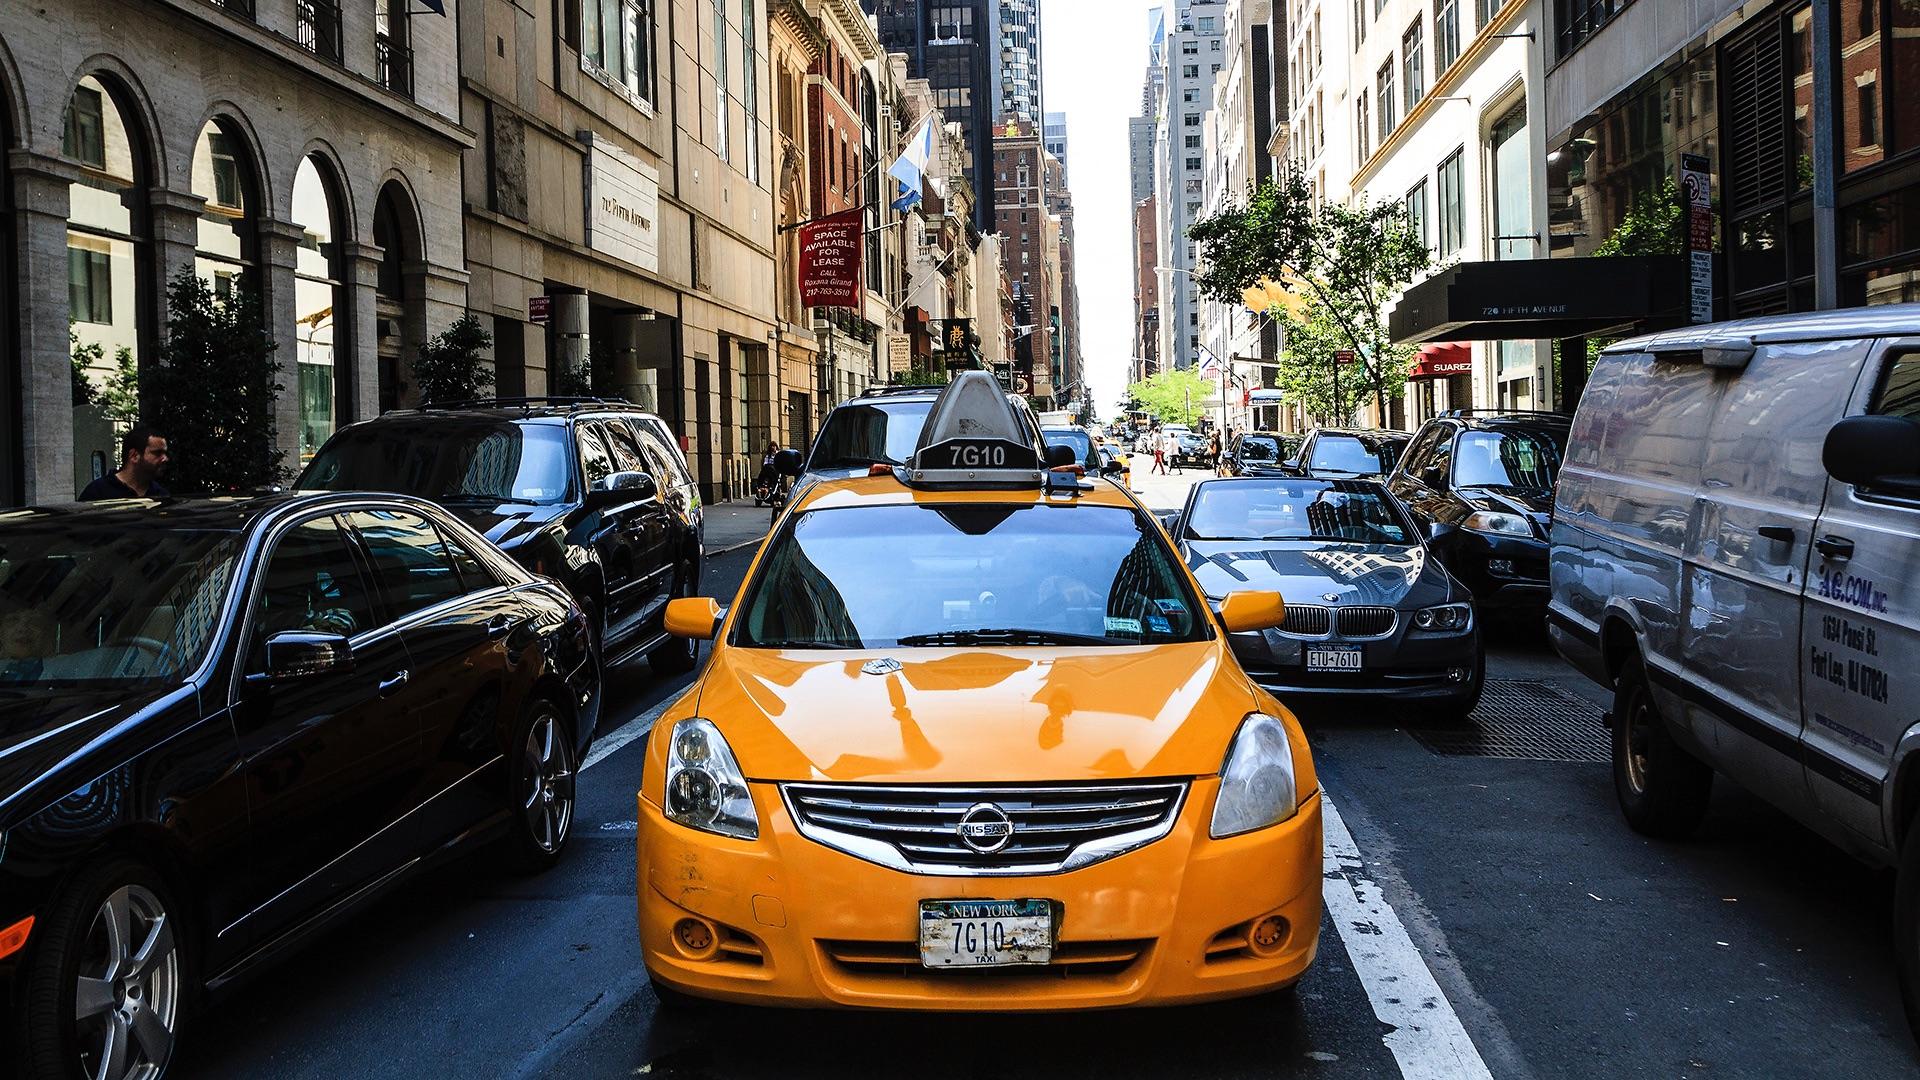 traffic scene in new york city (manhattan)